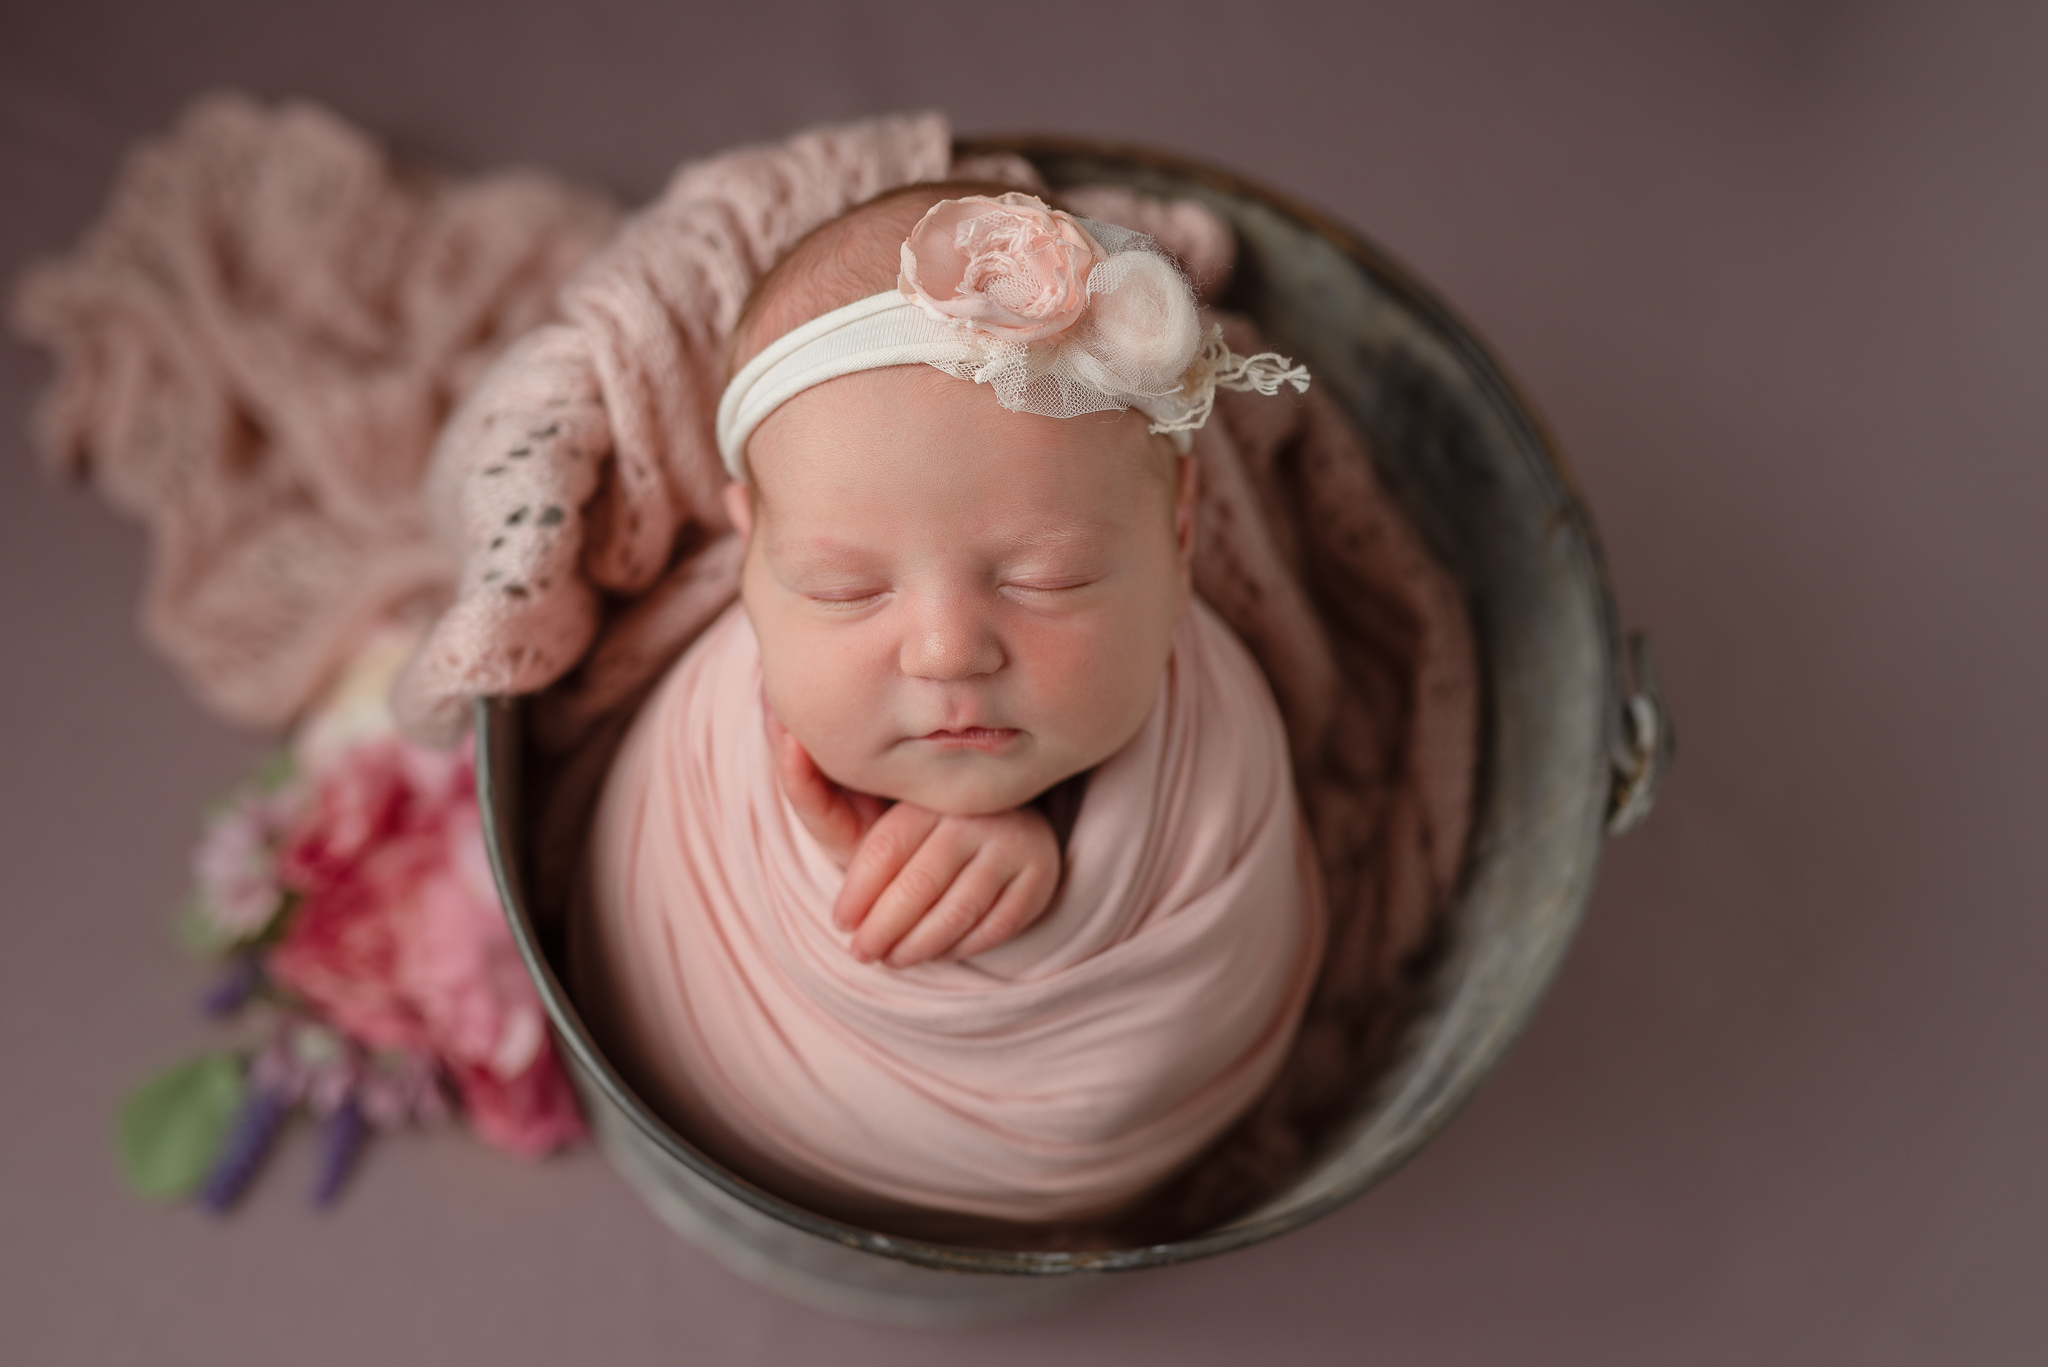 Newborn105NaomiLuciennePhotography032019-2-Edit.jpg